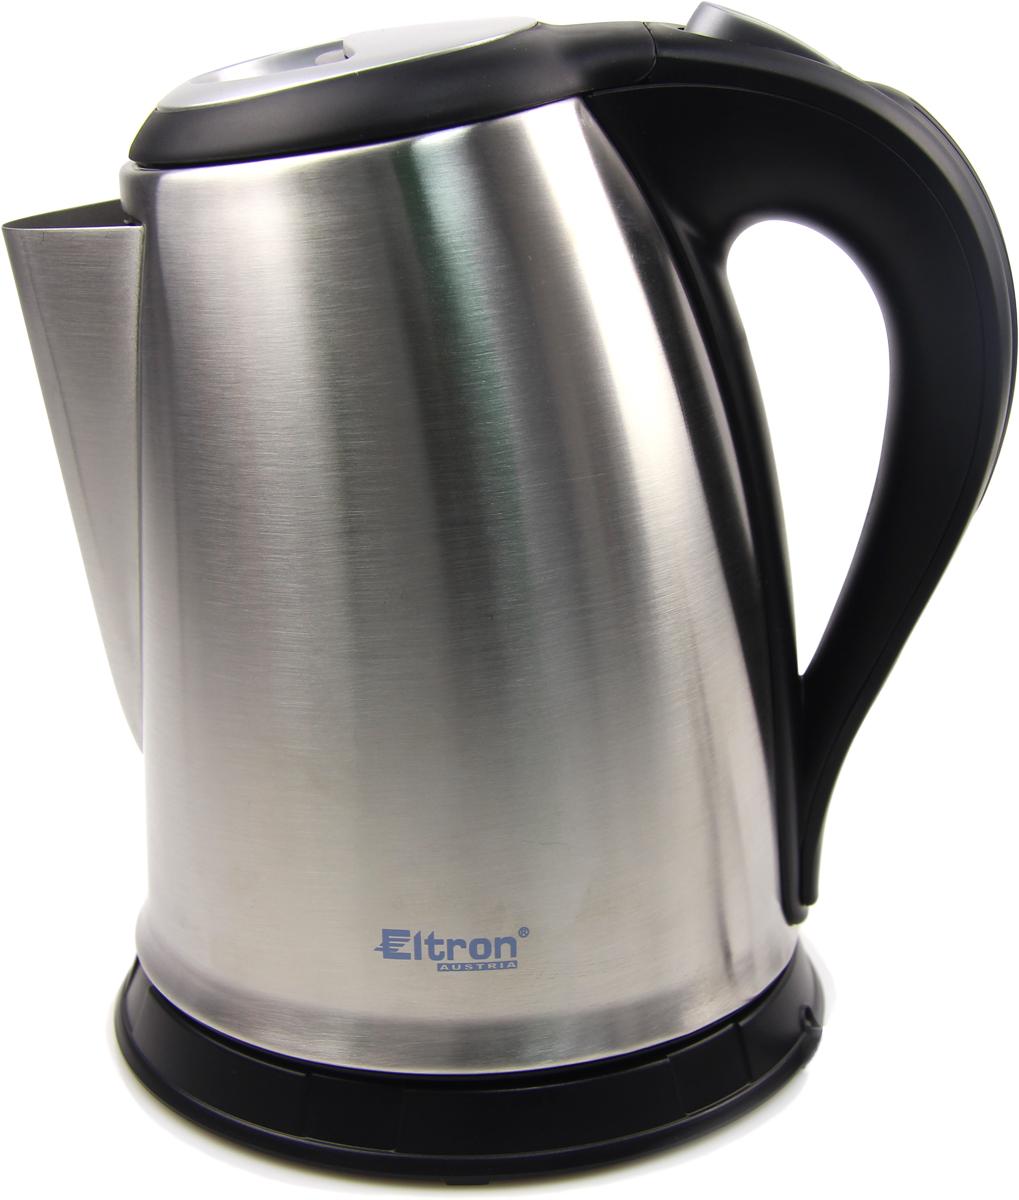 Eltron 6676, Silver электрический чайник